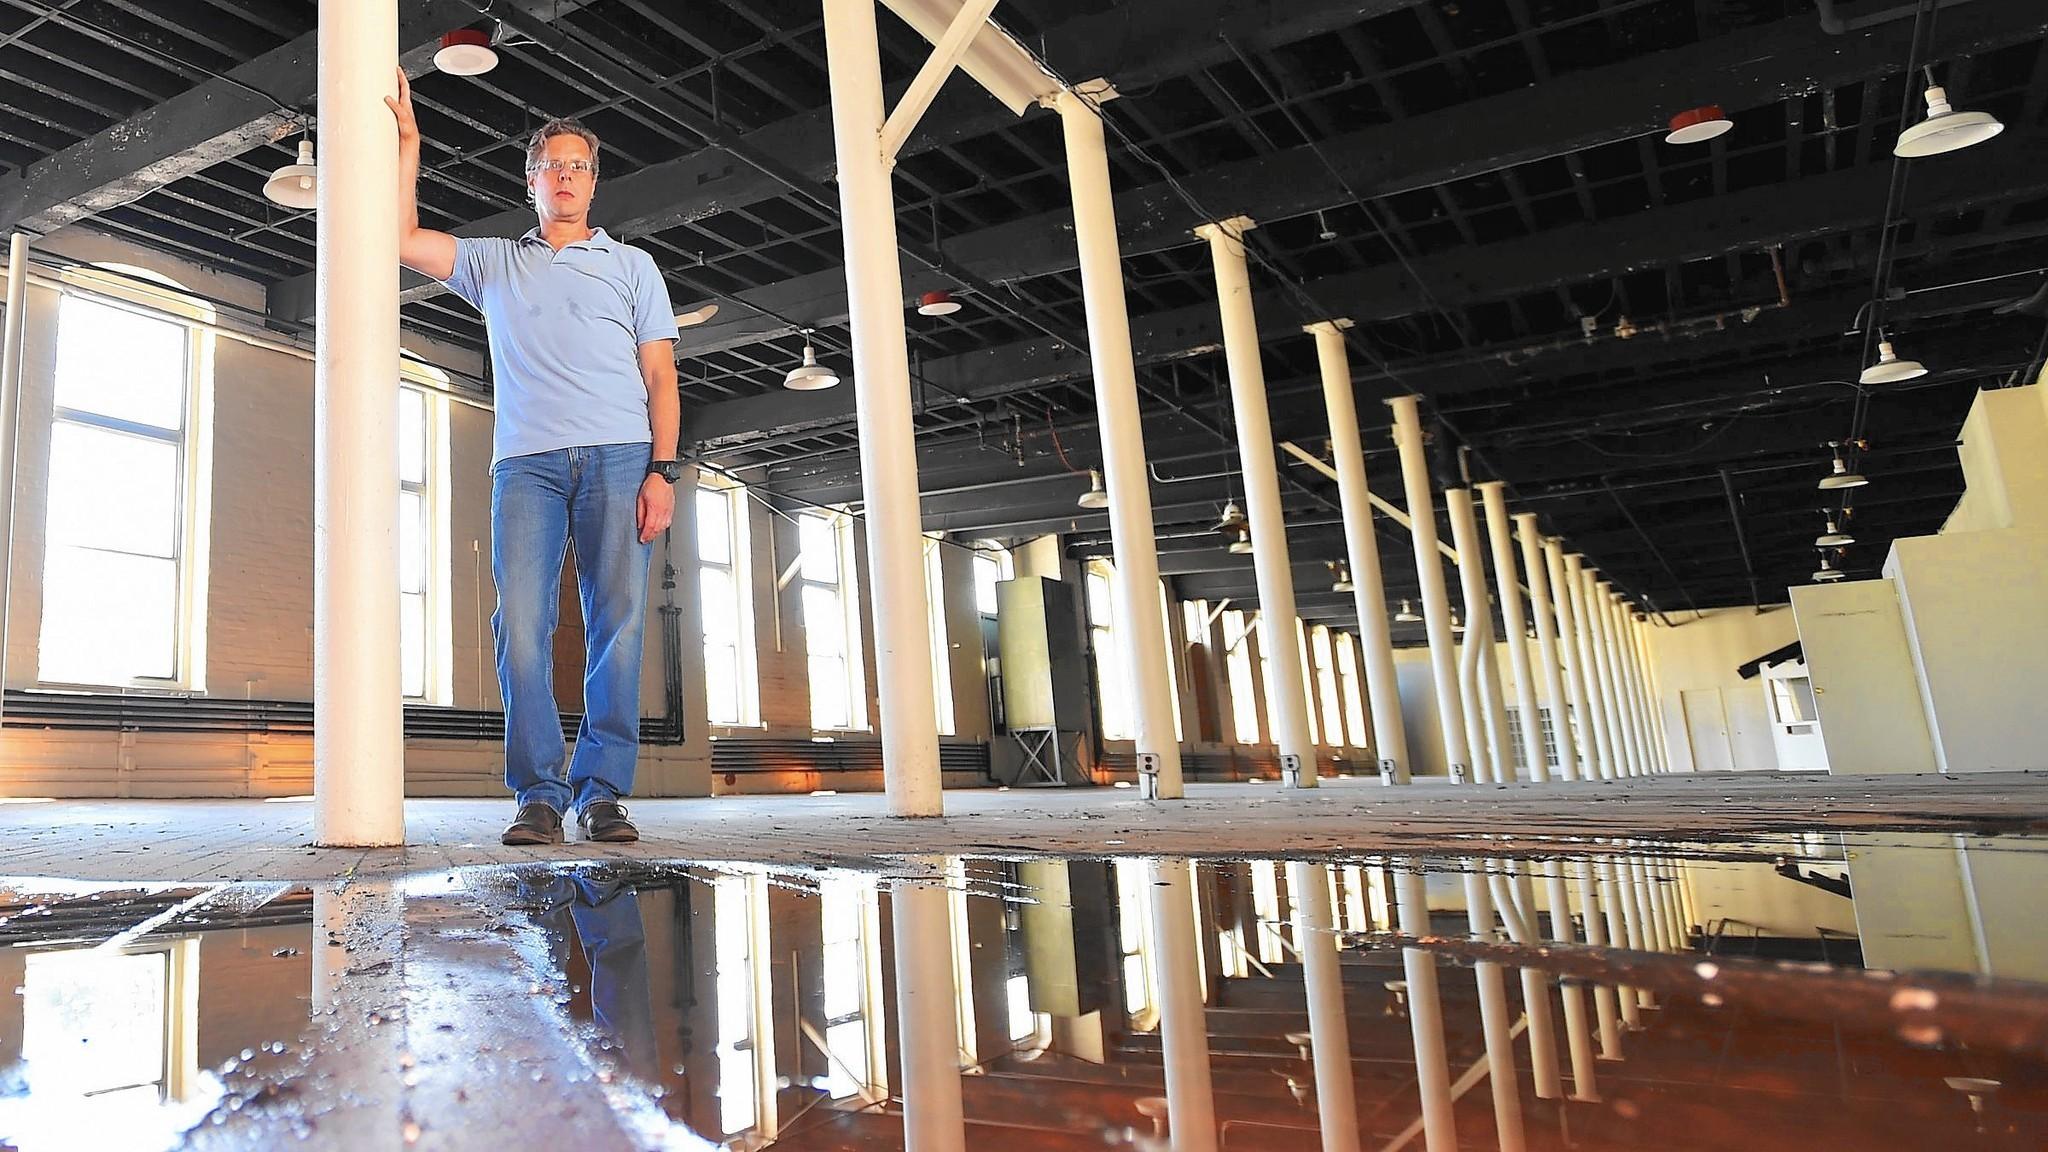 Developer Plans To Convert Massive Downtown Allentown Mill